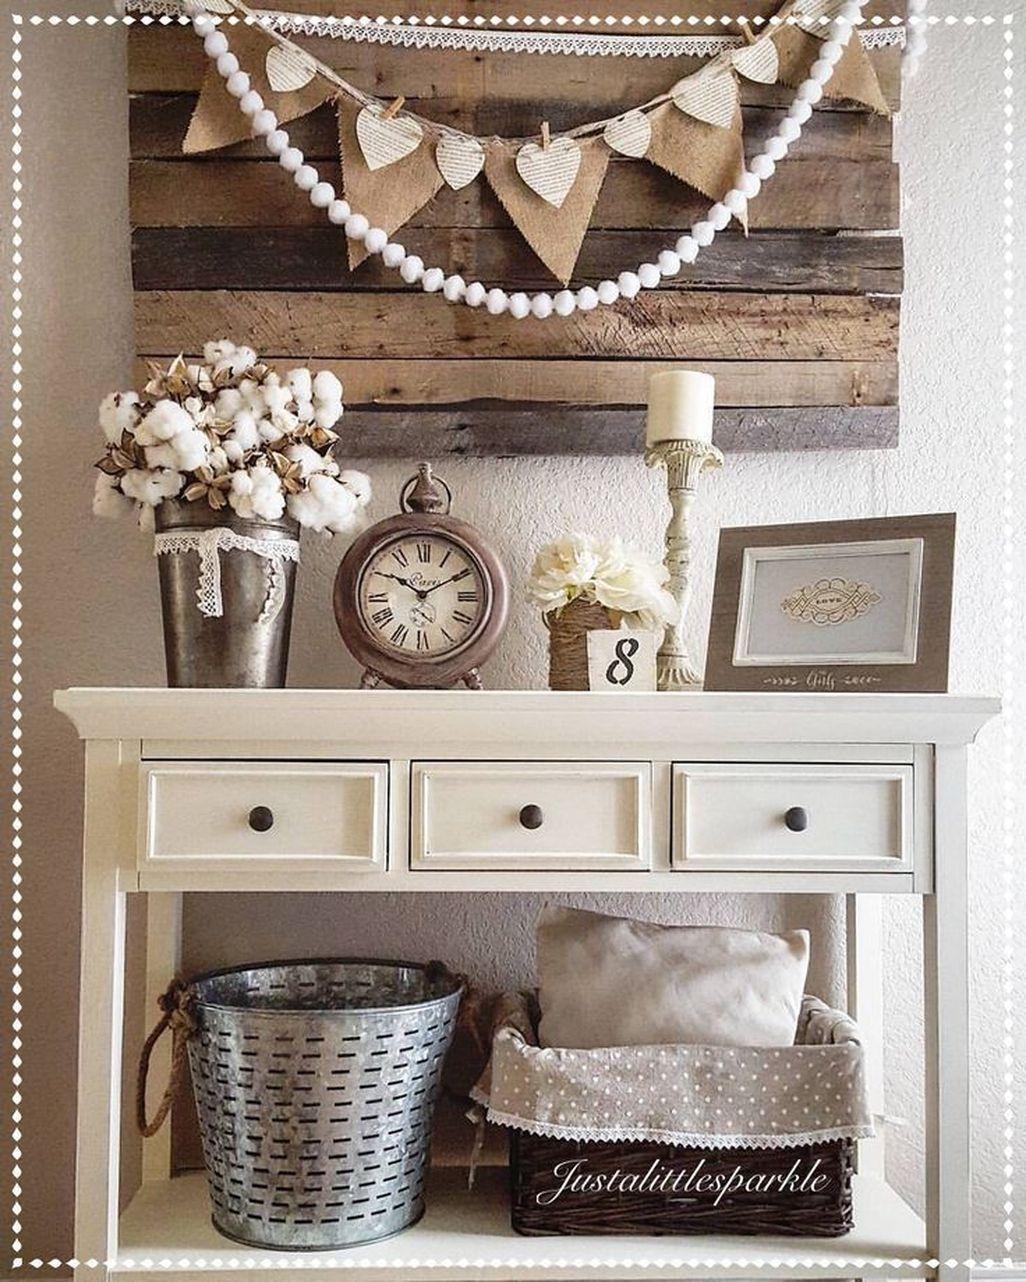 43 Beautiful Rustic Entryway Decoration Ideas